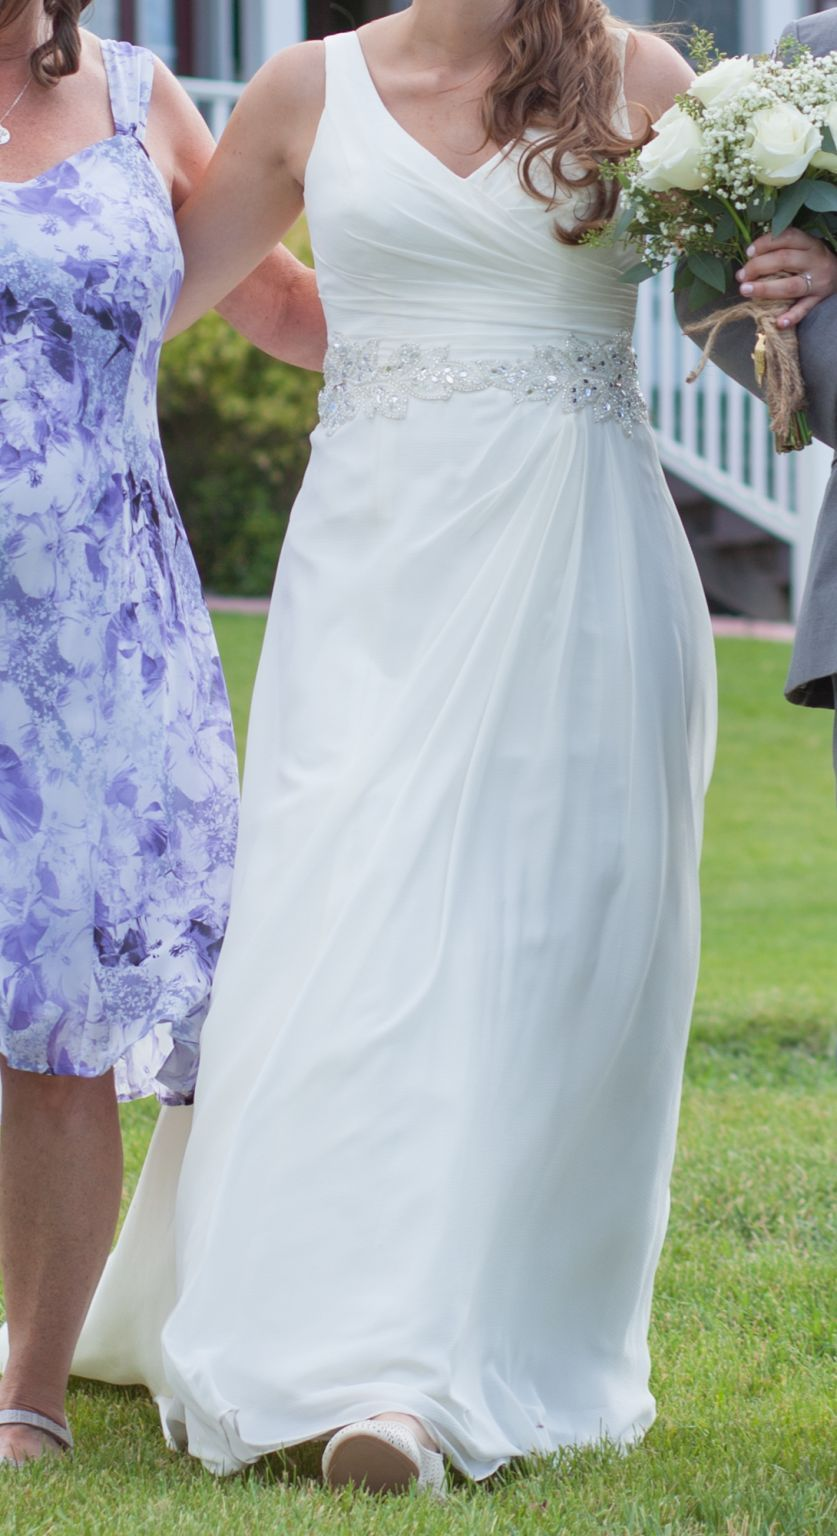 947626a3b37b David's Bridal V3677, $350 Size: 10 | Used Wedding Dresses | wedding ...